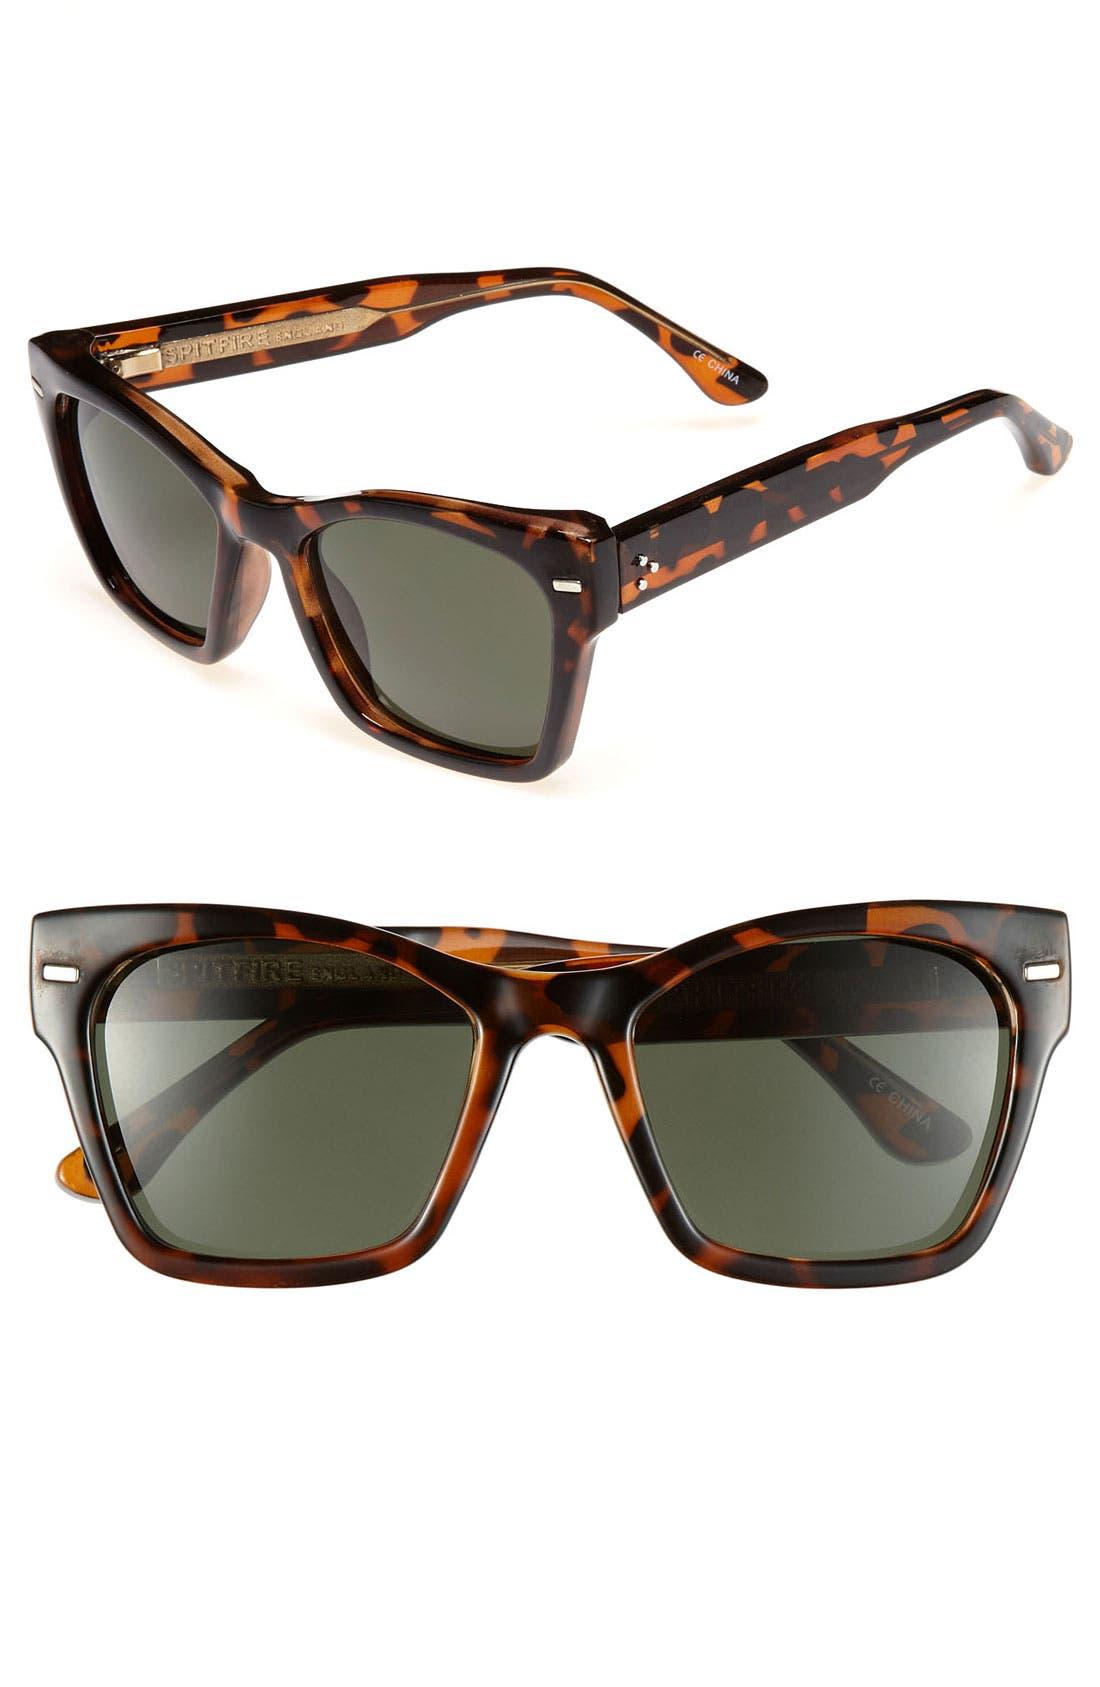 Main Image - Spitfire 53mm Retro Sunglasses